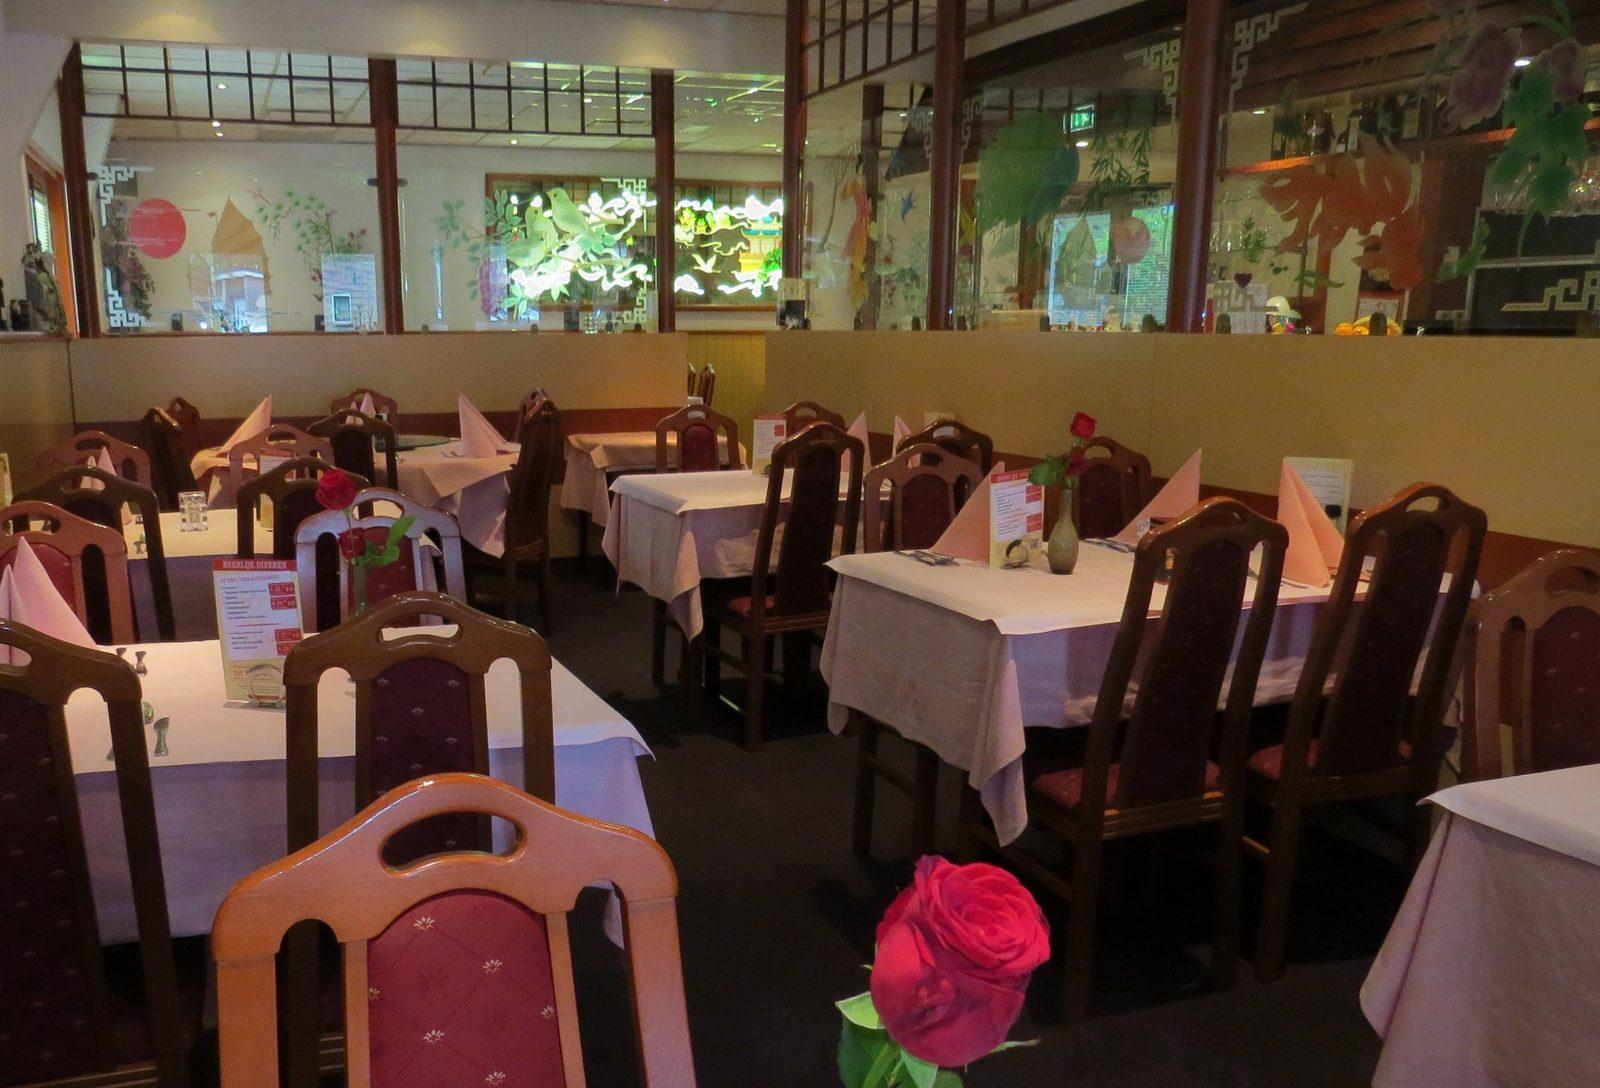 Chinees restaurant AH Tim